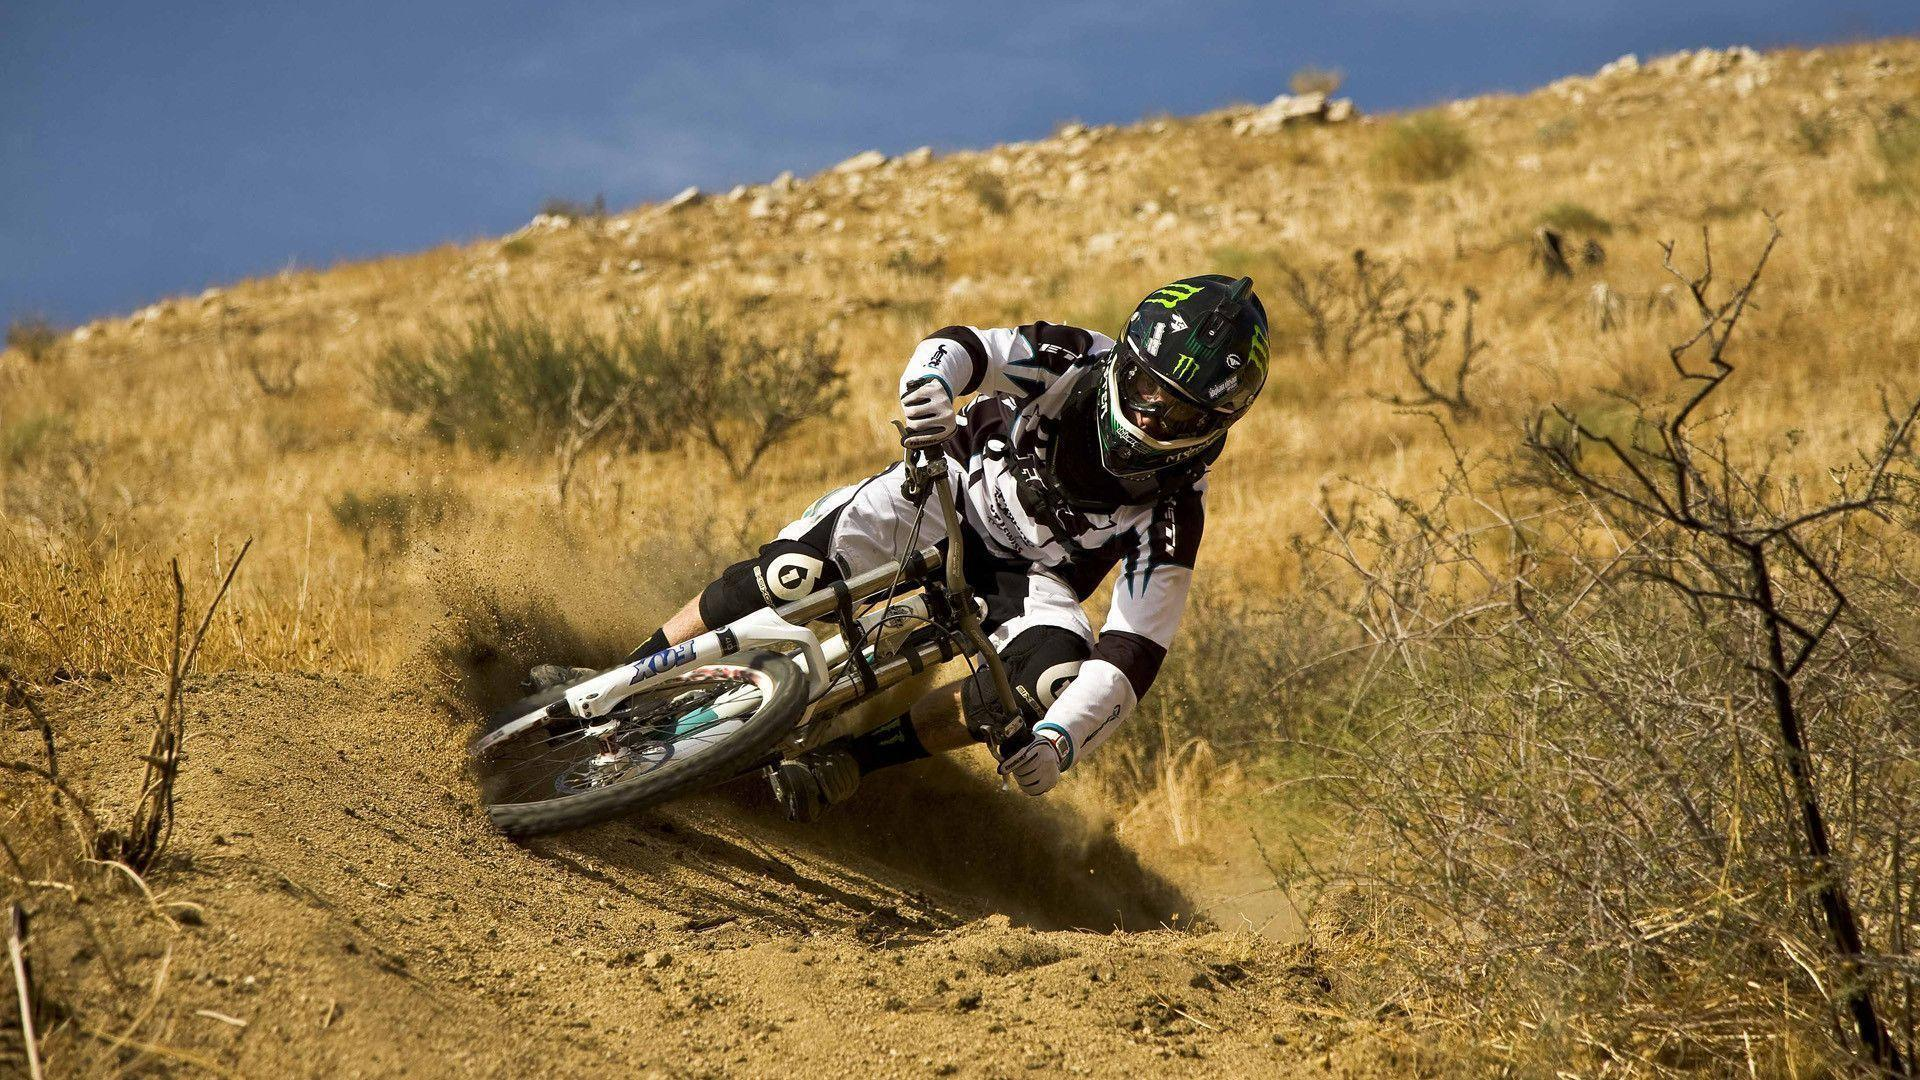 bikes wallpapers full screen - photo #28